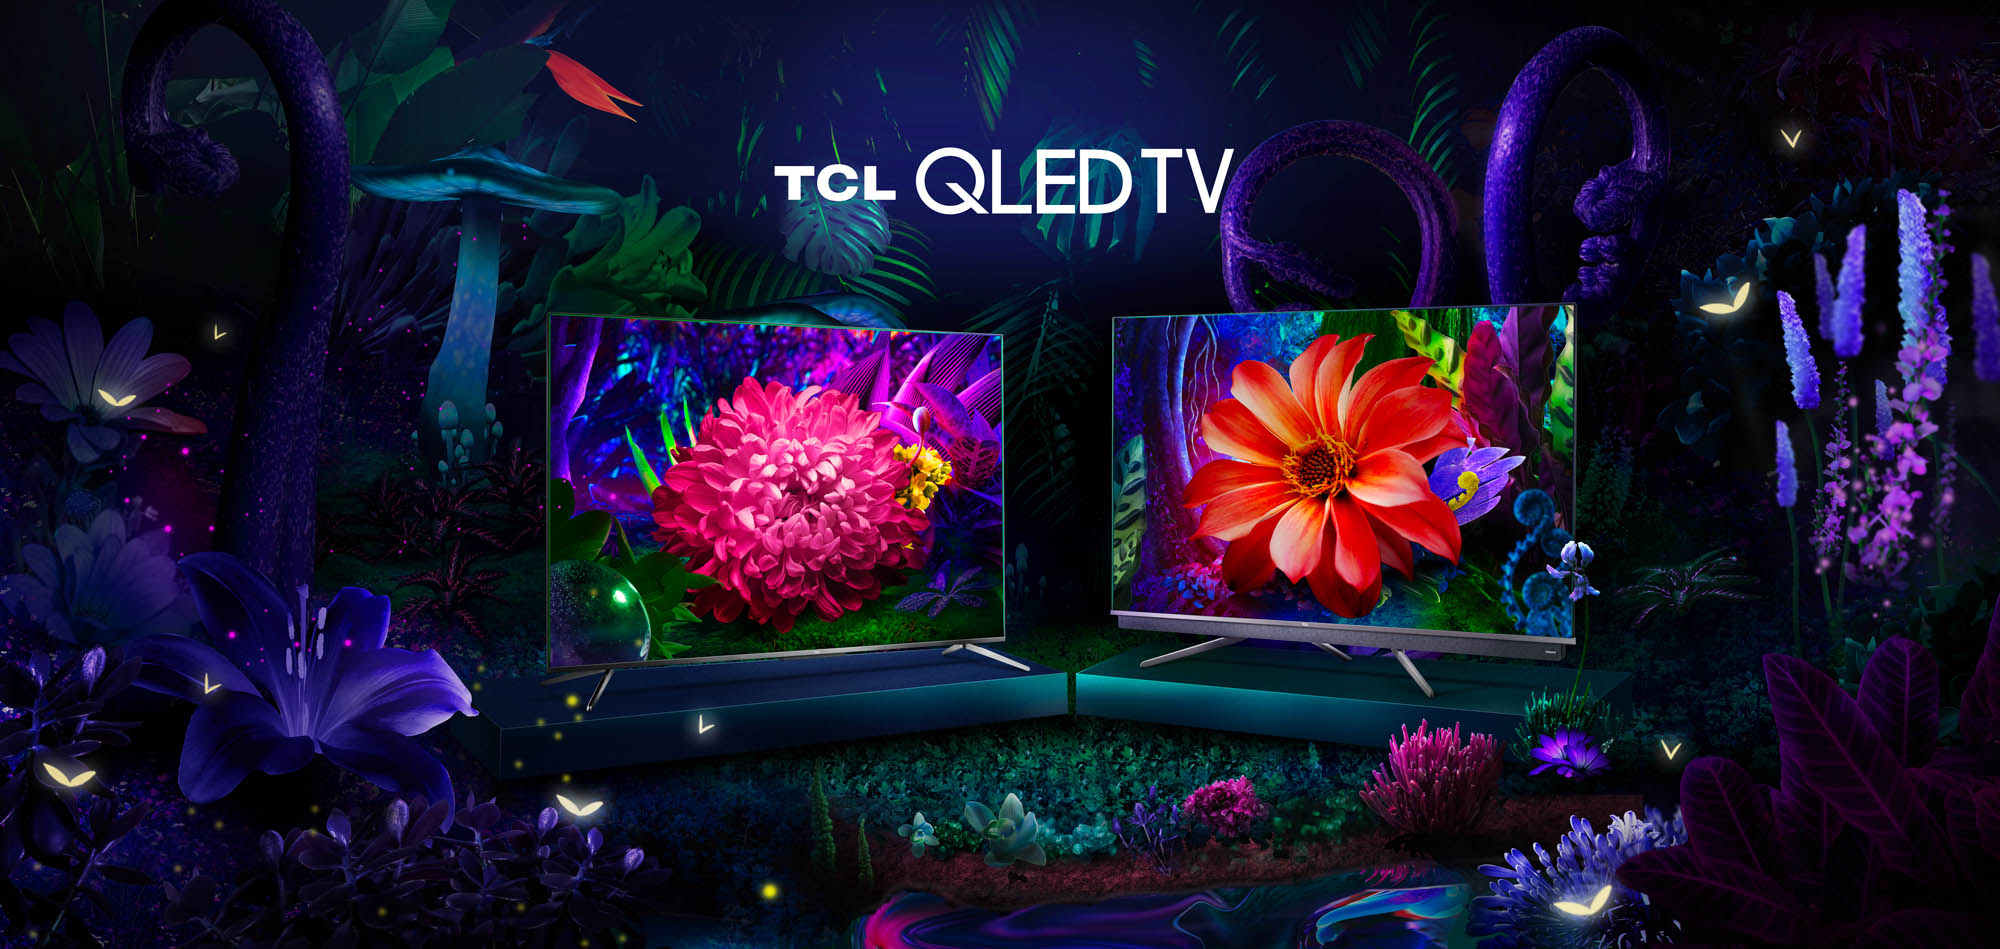 TCL QLED TV C715 & 815